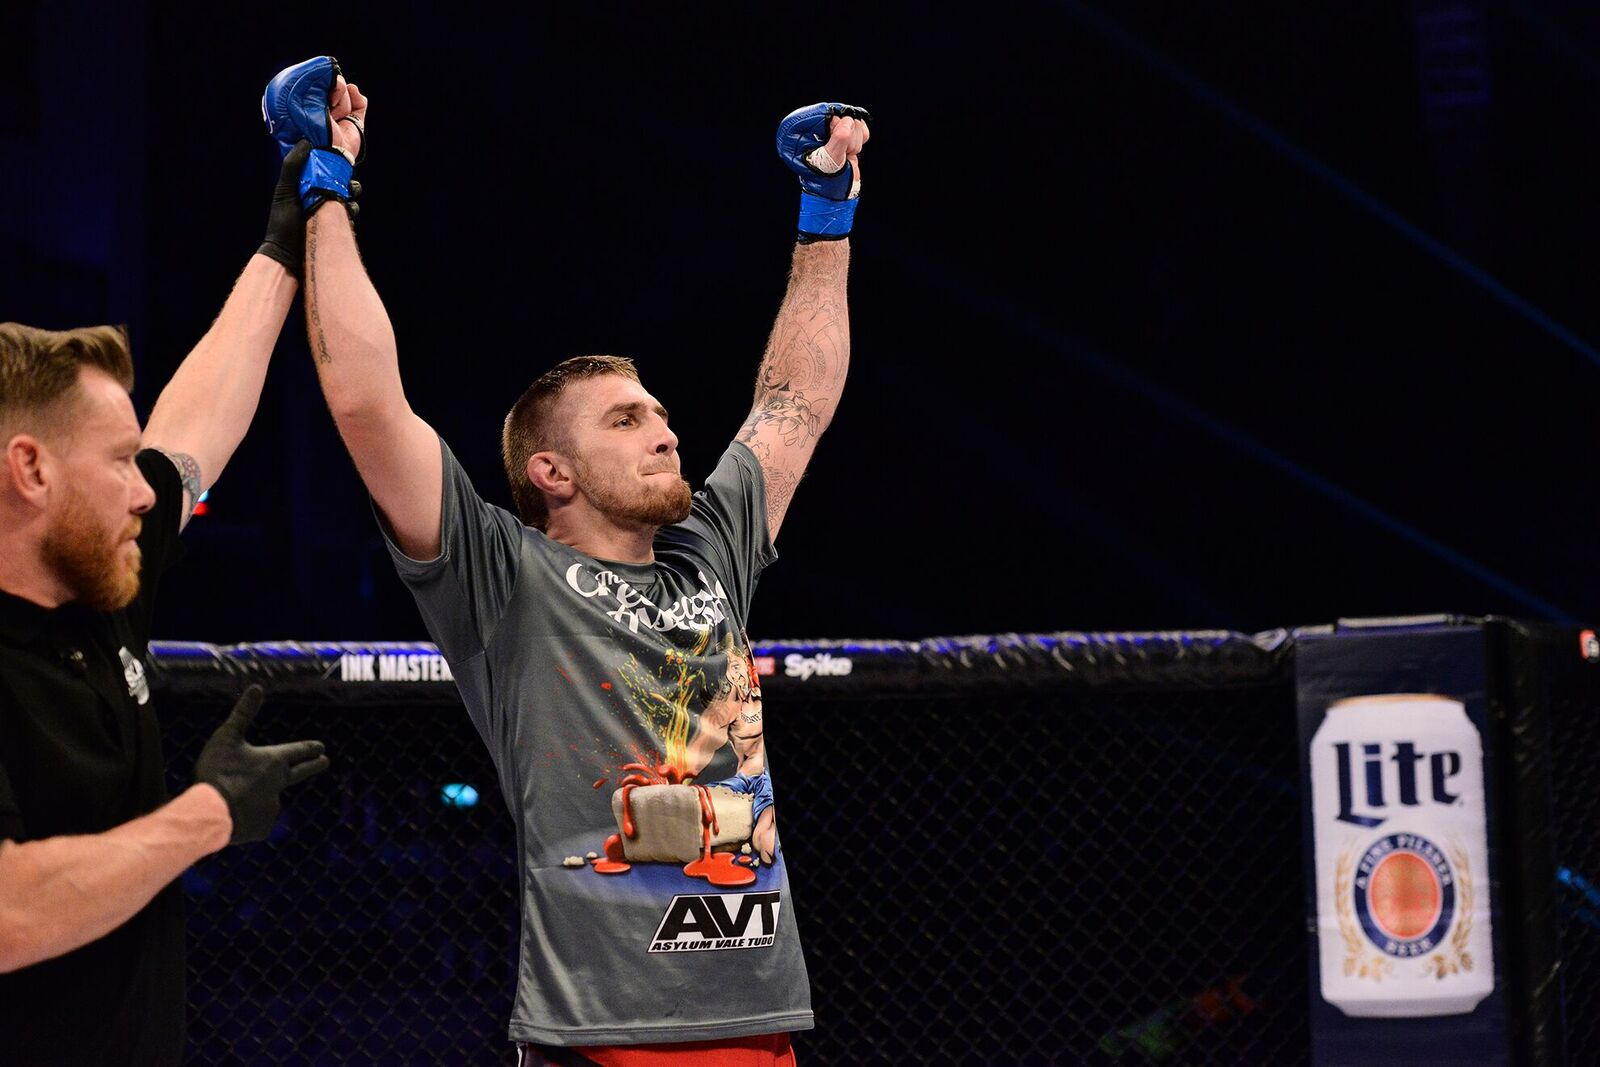 Danny Mitchell - Image Credit: Bellator MMA